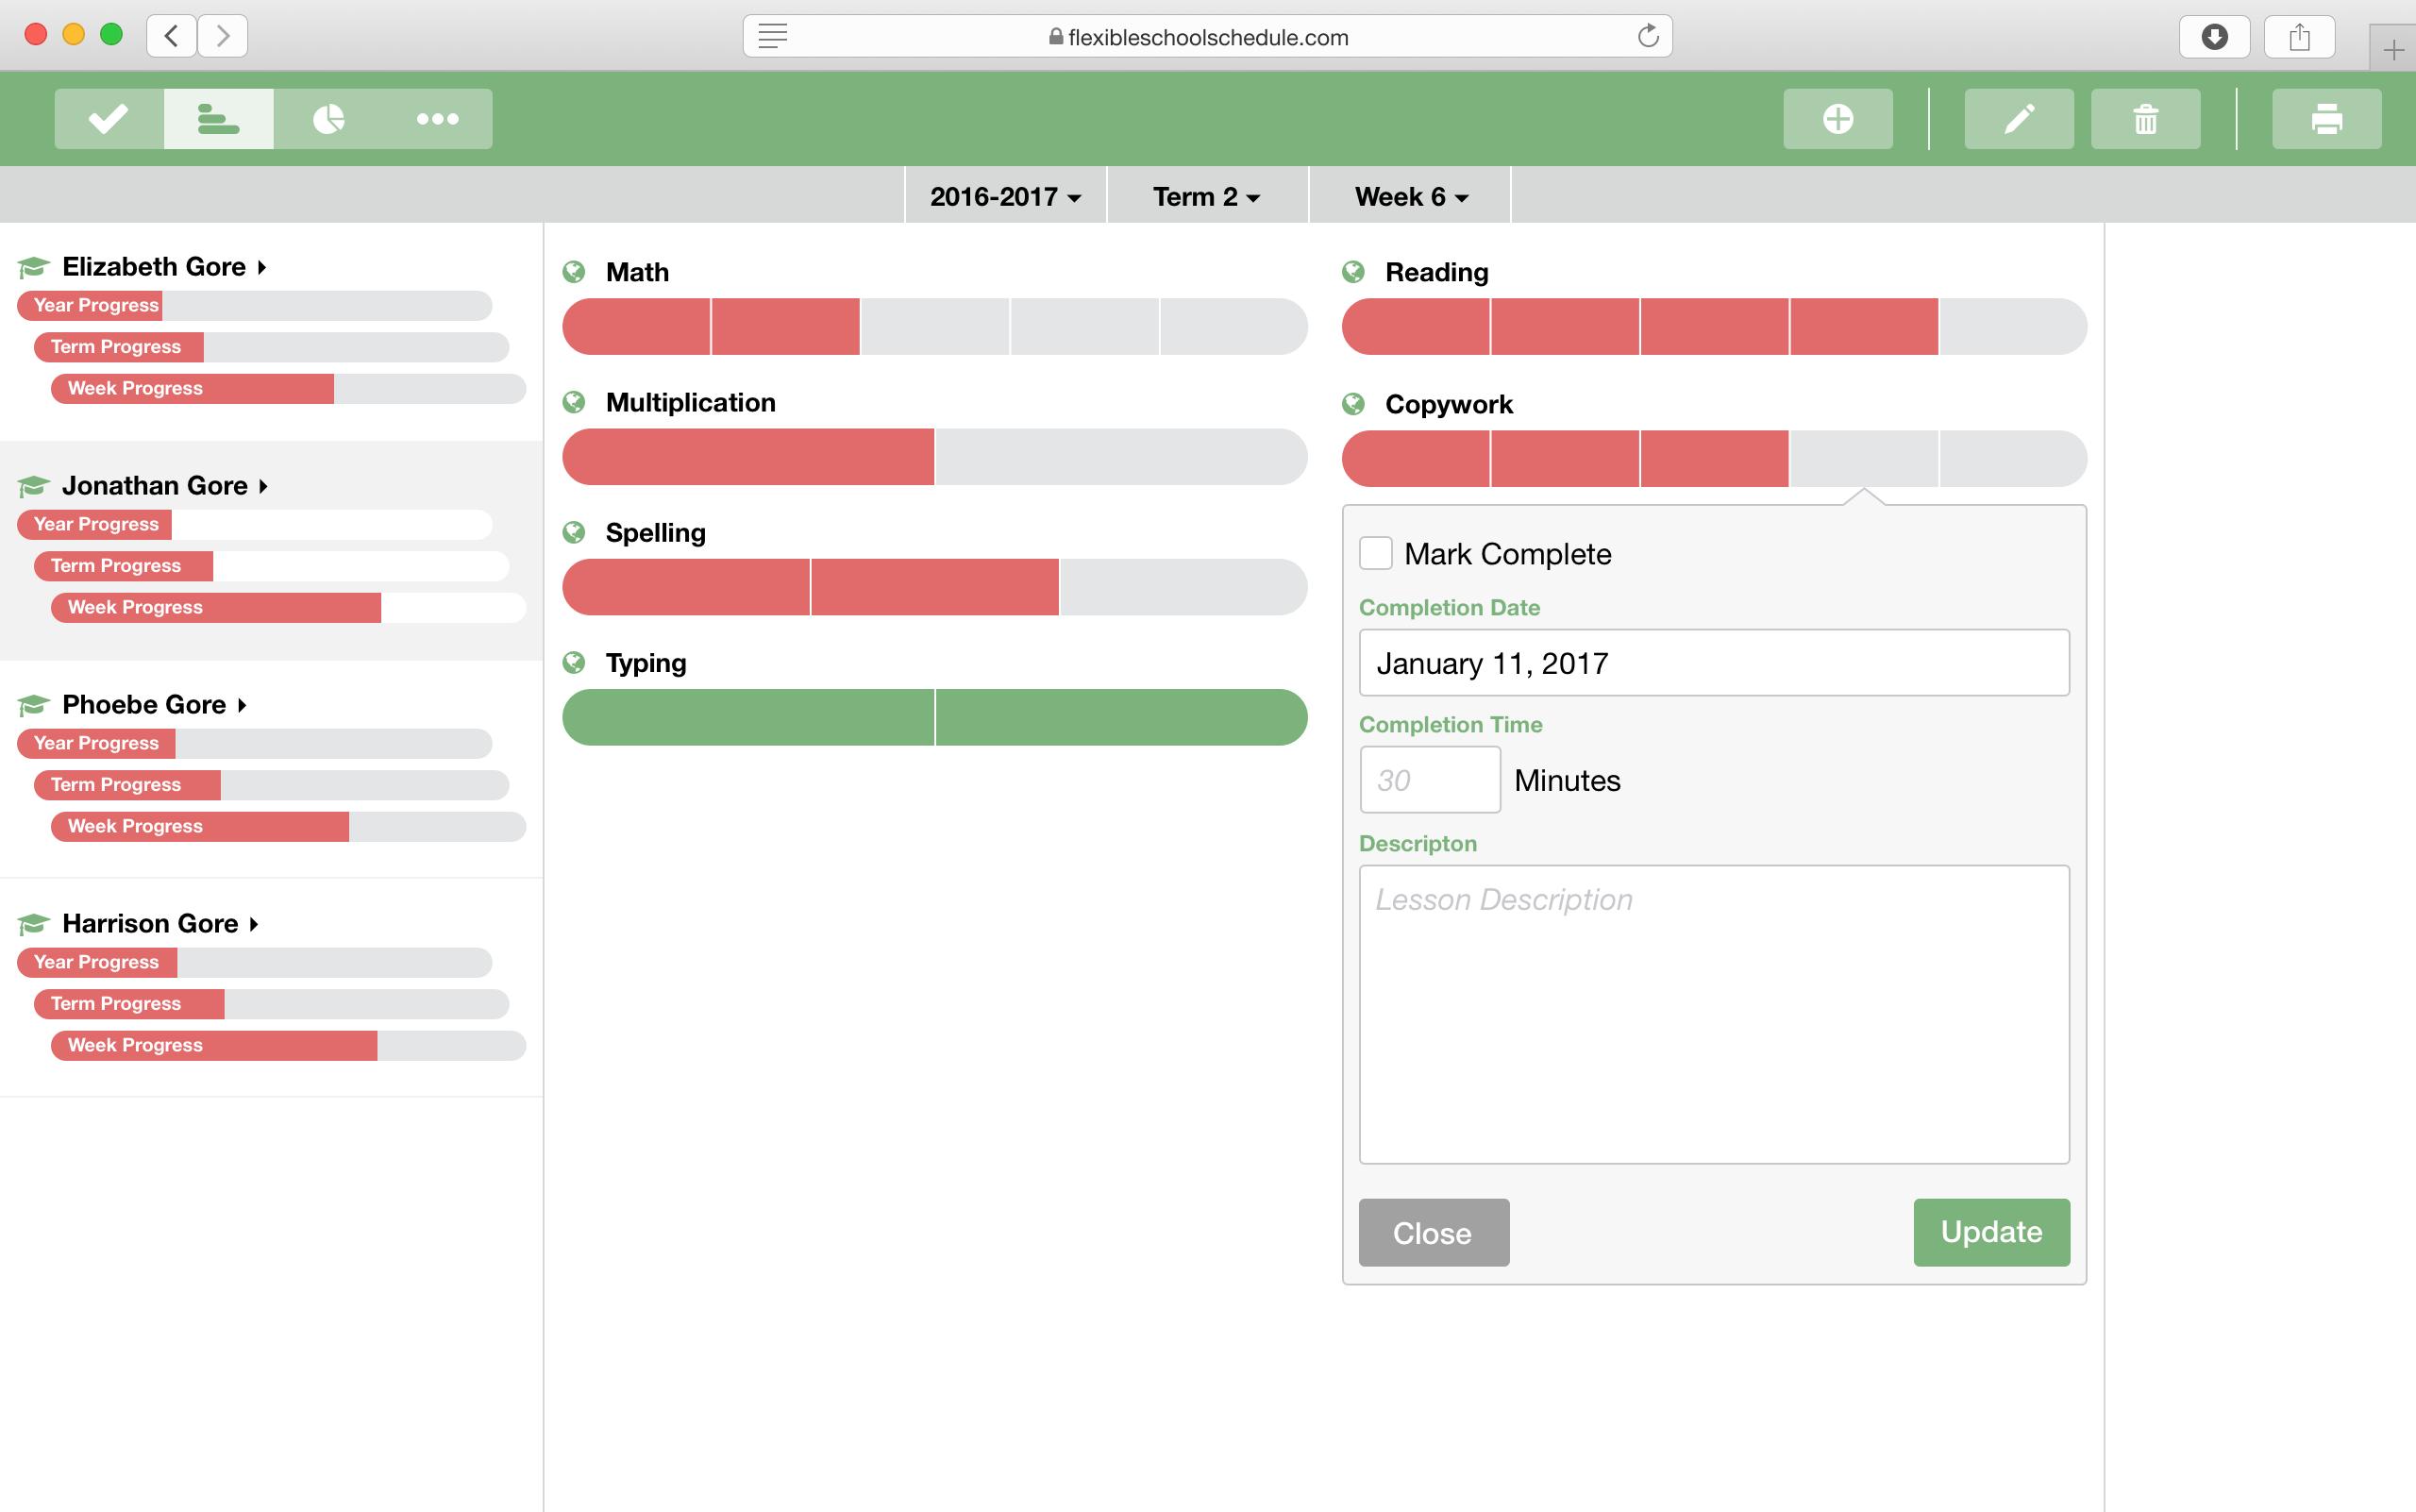 Flexible School Schedule Interface